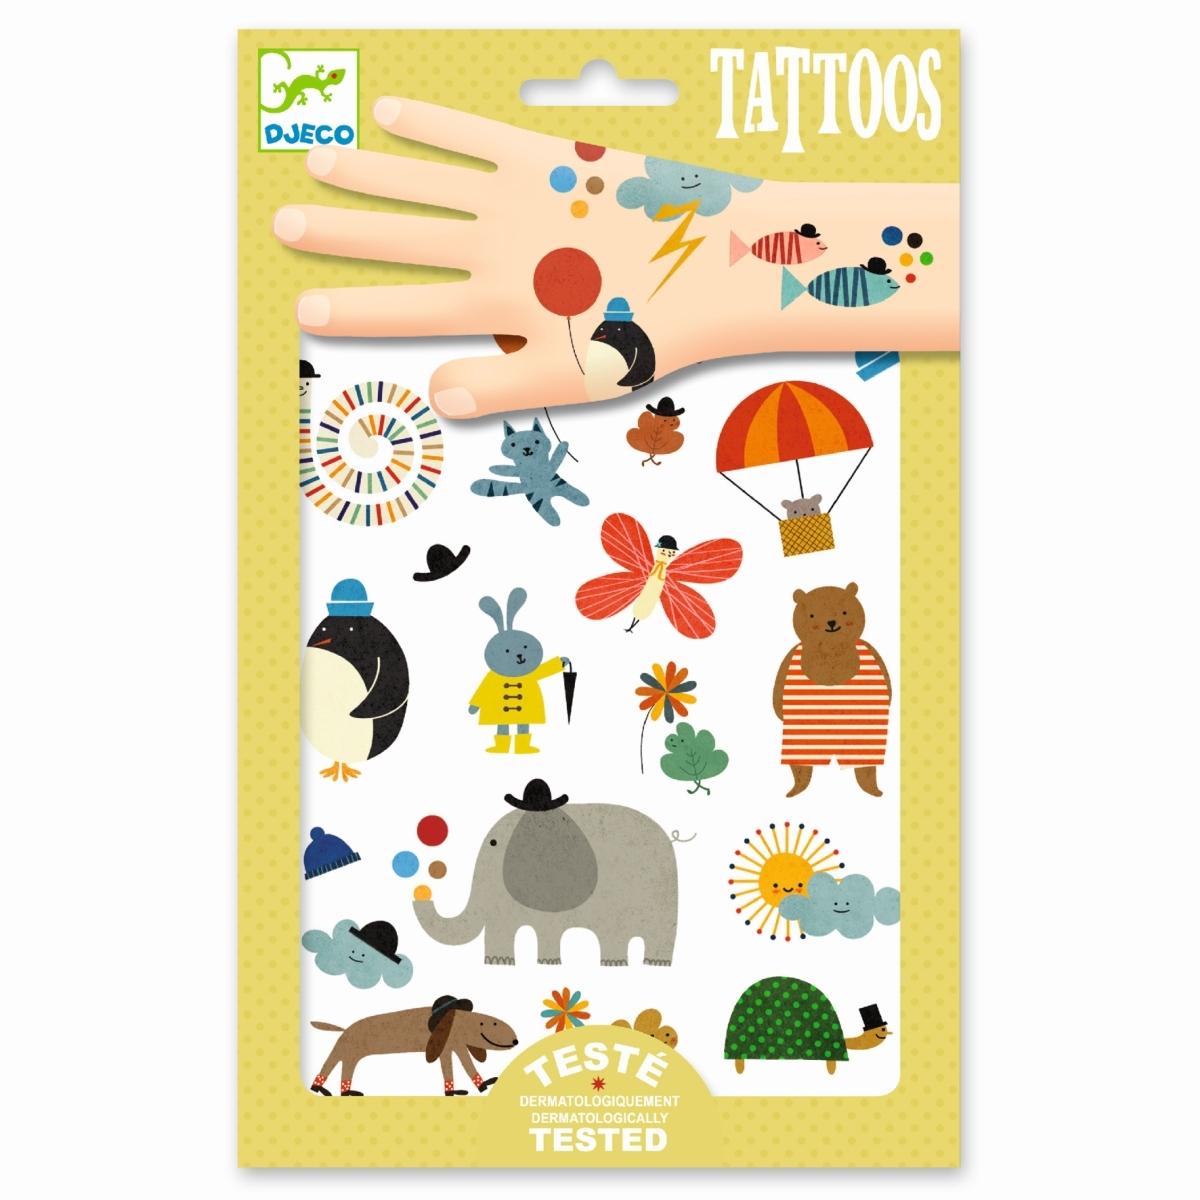 Djeco - Tattoos Süße Kleinigkeiten